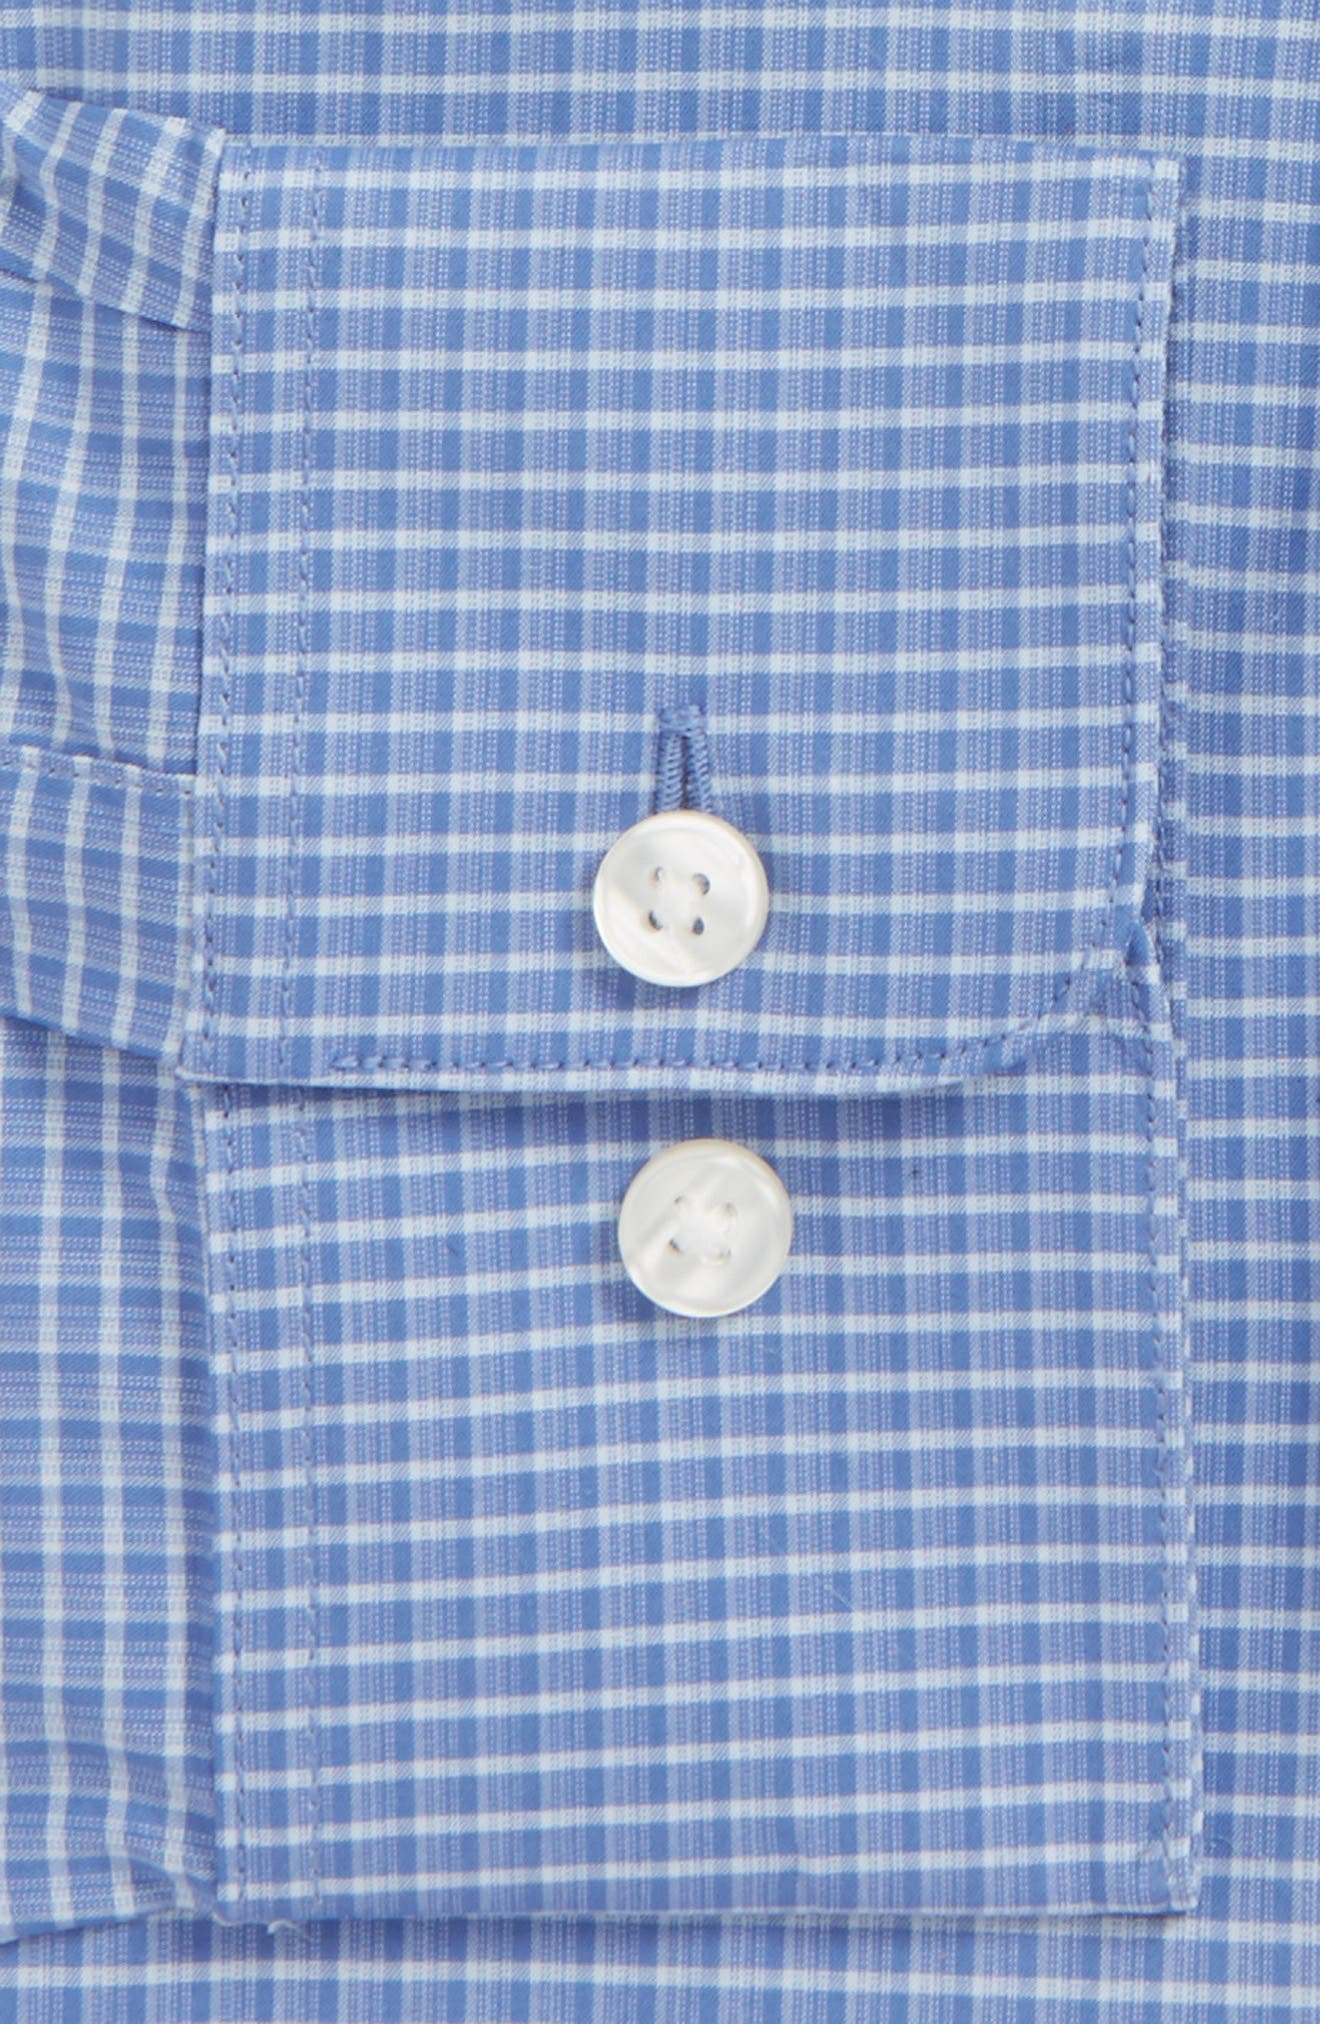 Regular Fit Stretch Plaid Dress Shirt,                             Alternate thumbnail 2, color,                             433